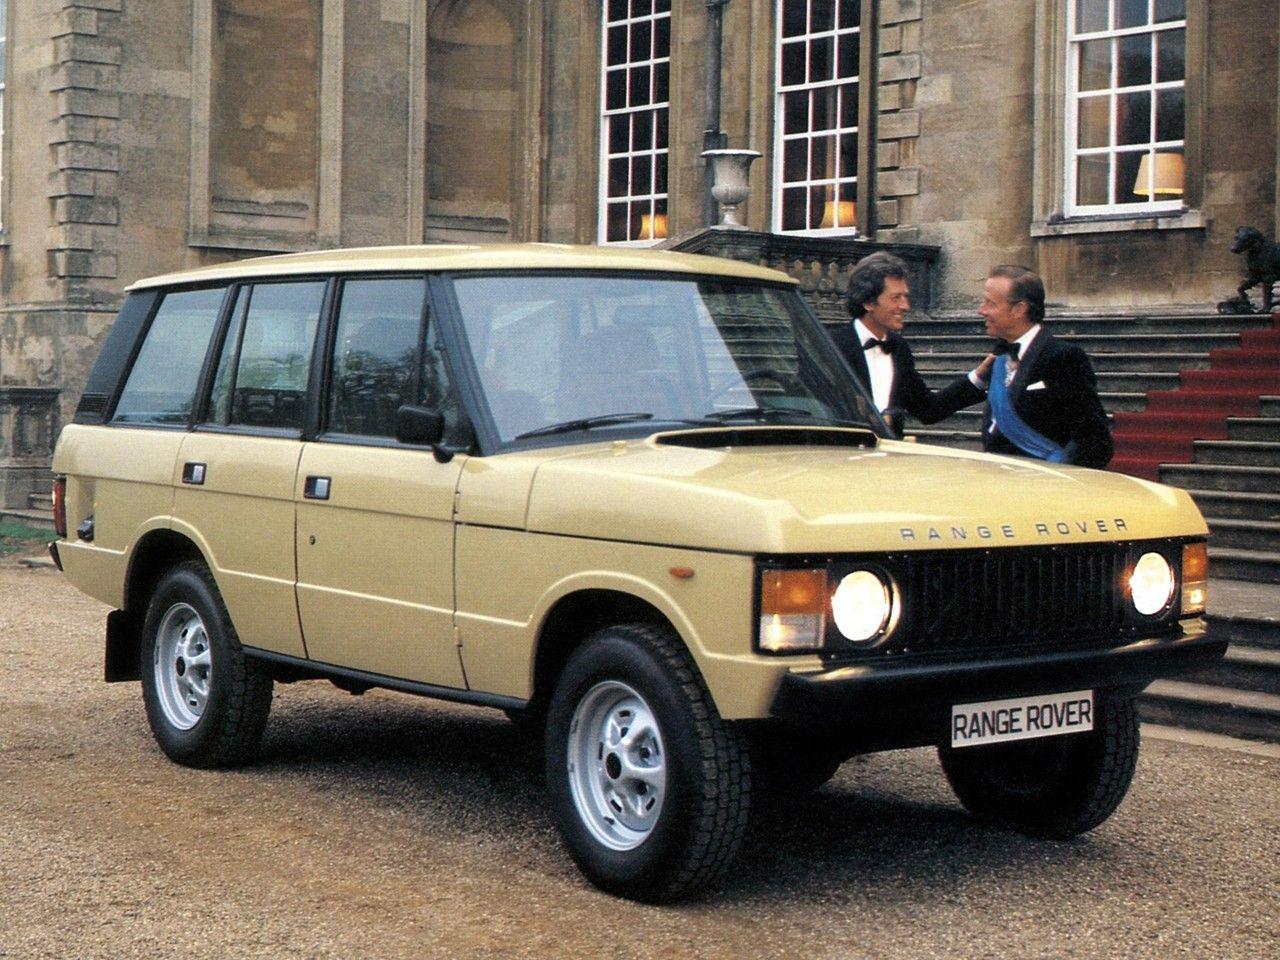 Range Rover 5 Door Worldwide 1981 86 Range Rover Range Rover Classic Range Rover Supercharged